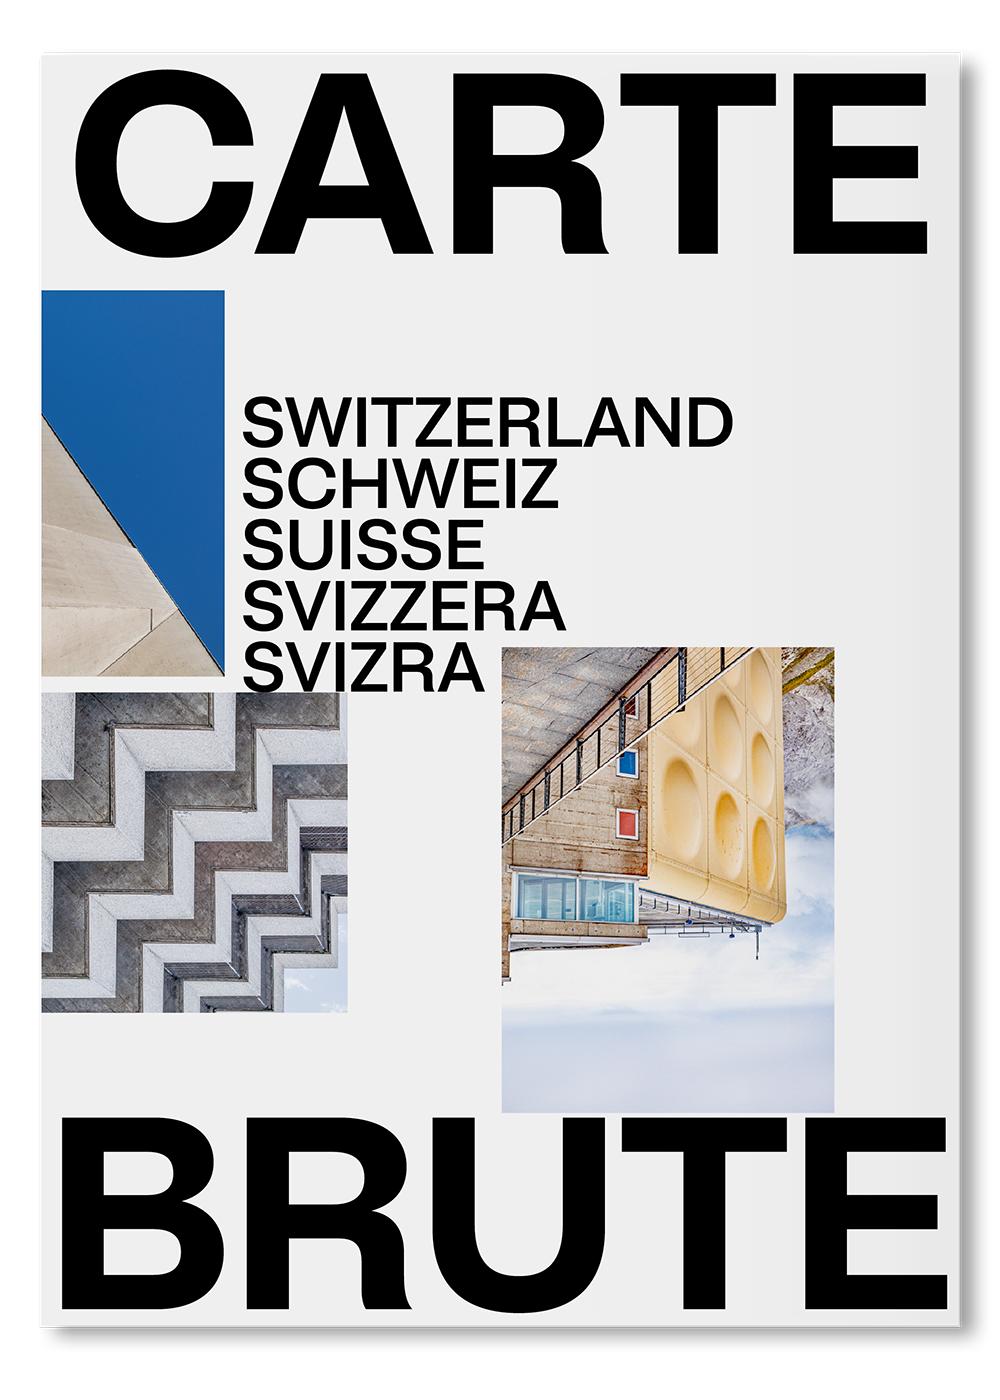 Carte Brute, 50 most striking Swiss béton brut icons from 1927 to today, folded map, cover, © IMG: Karin Bürki / HEARTBRUT, © DESIGN: lugma I Shop on Heartbrut.com